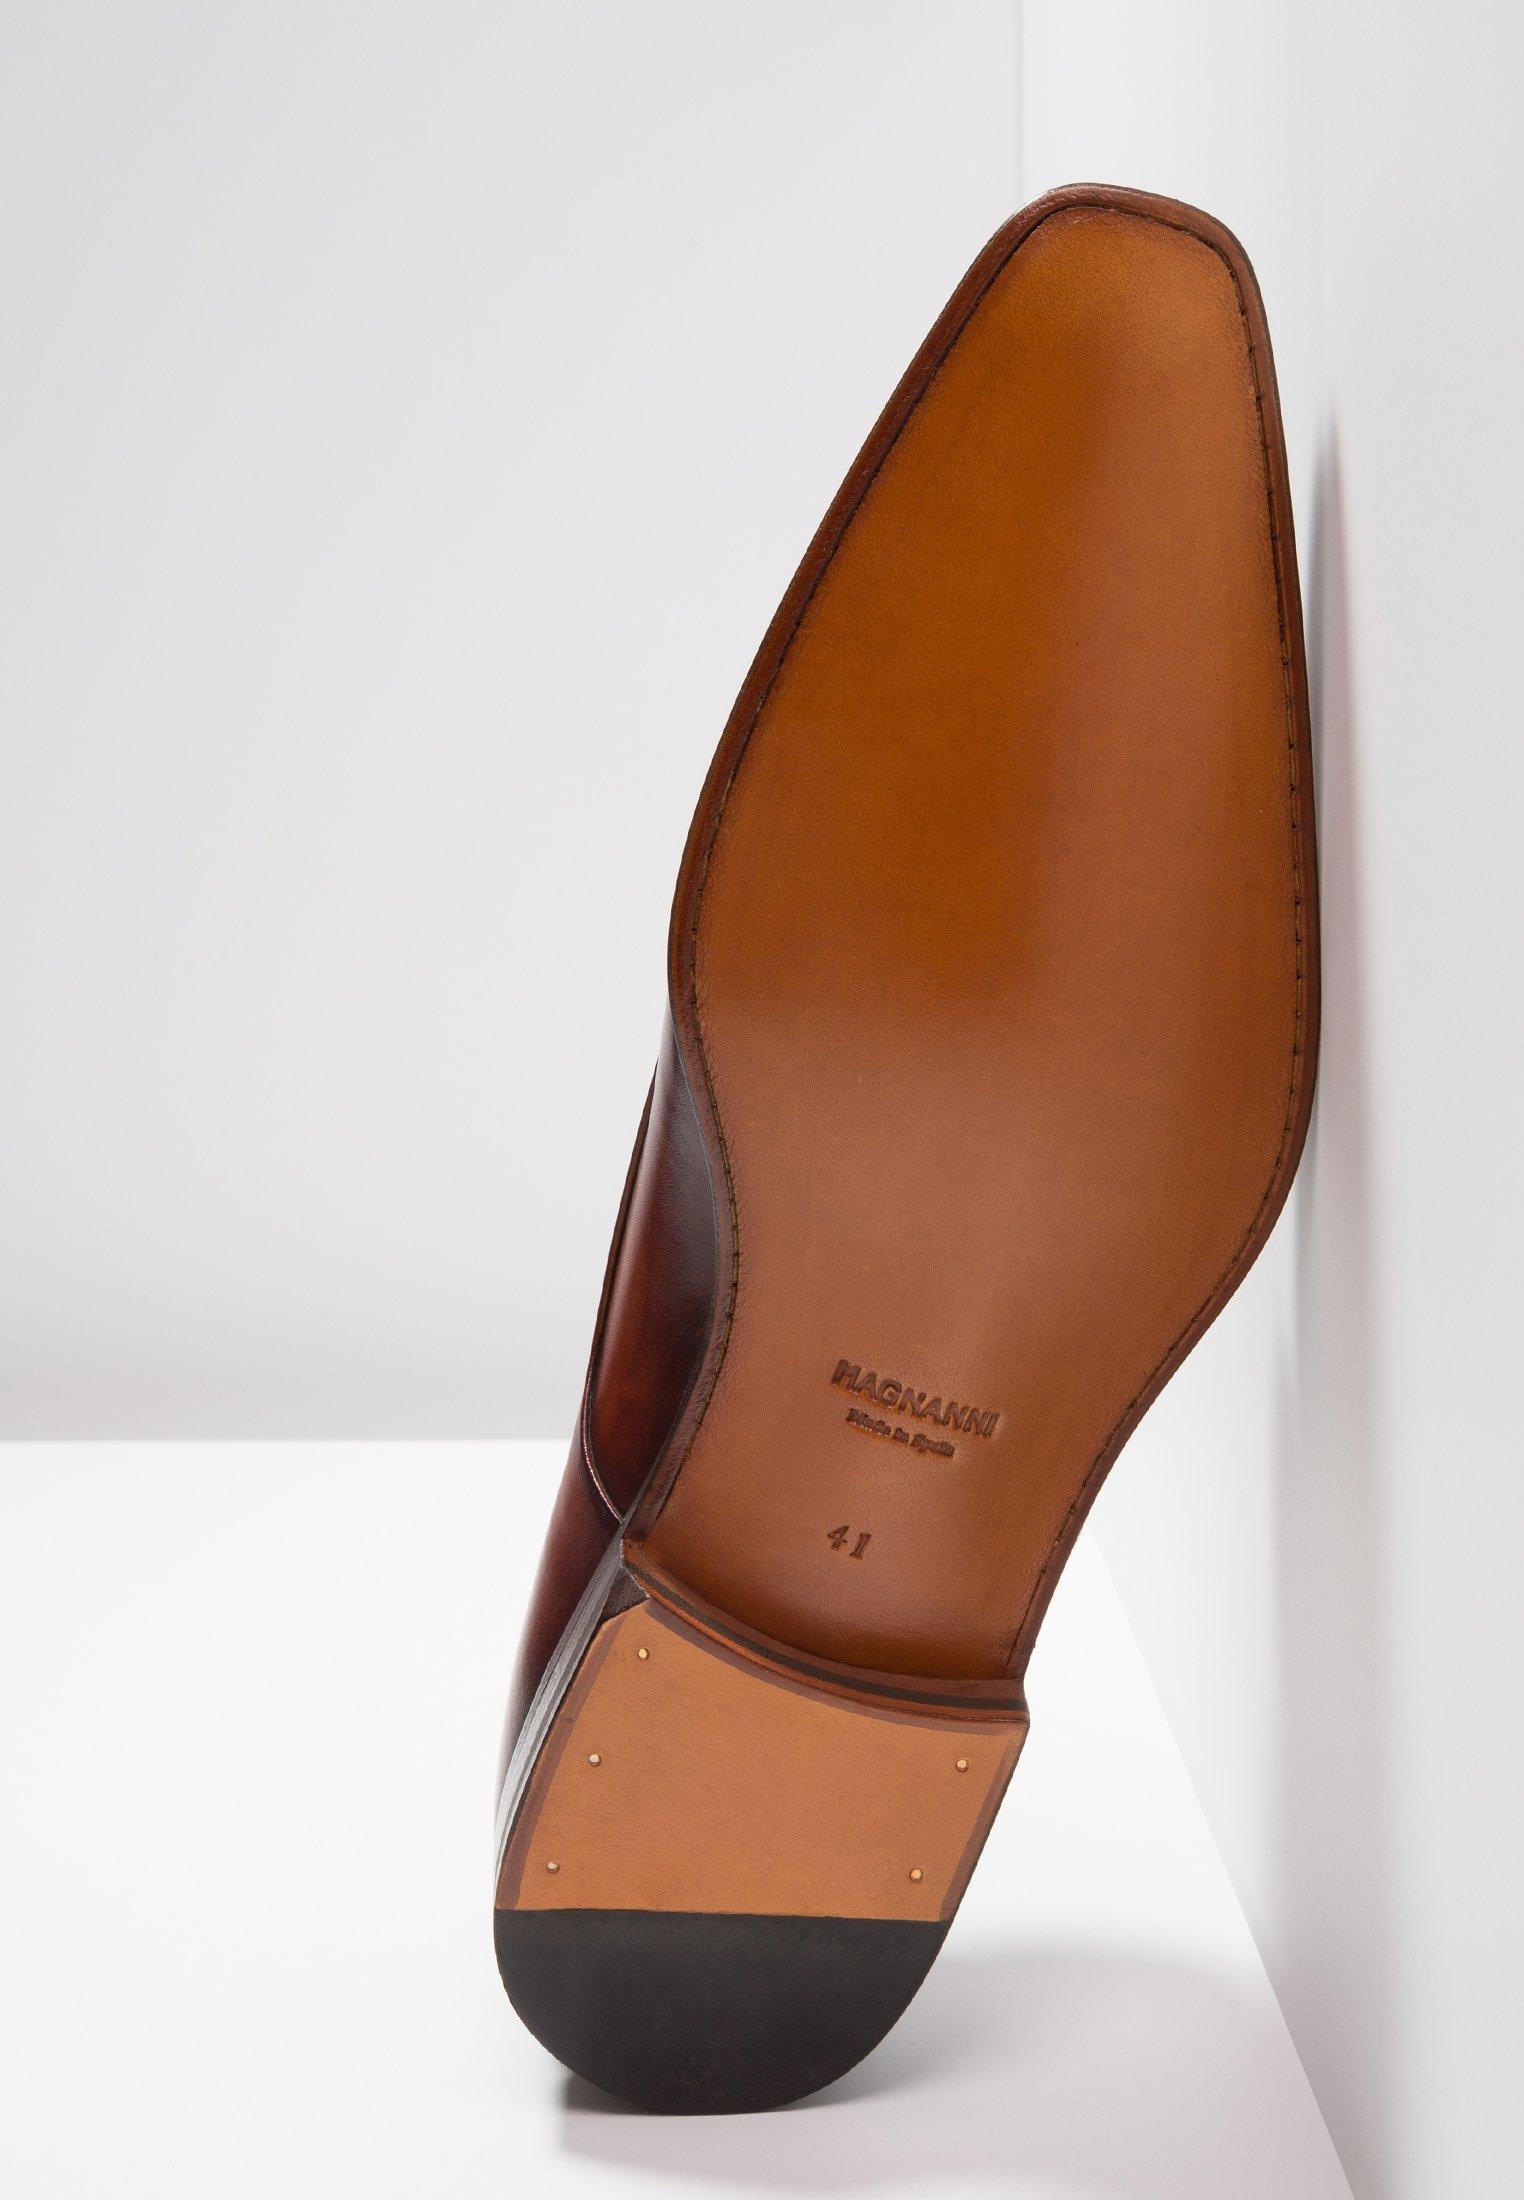 Magnanni Slip-ins - acada cognac/cognac - Herrskor hJK1X